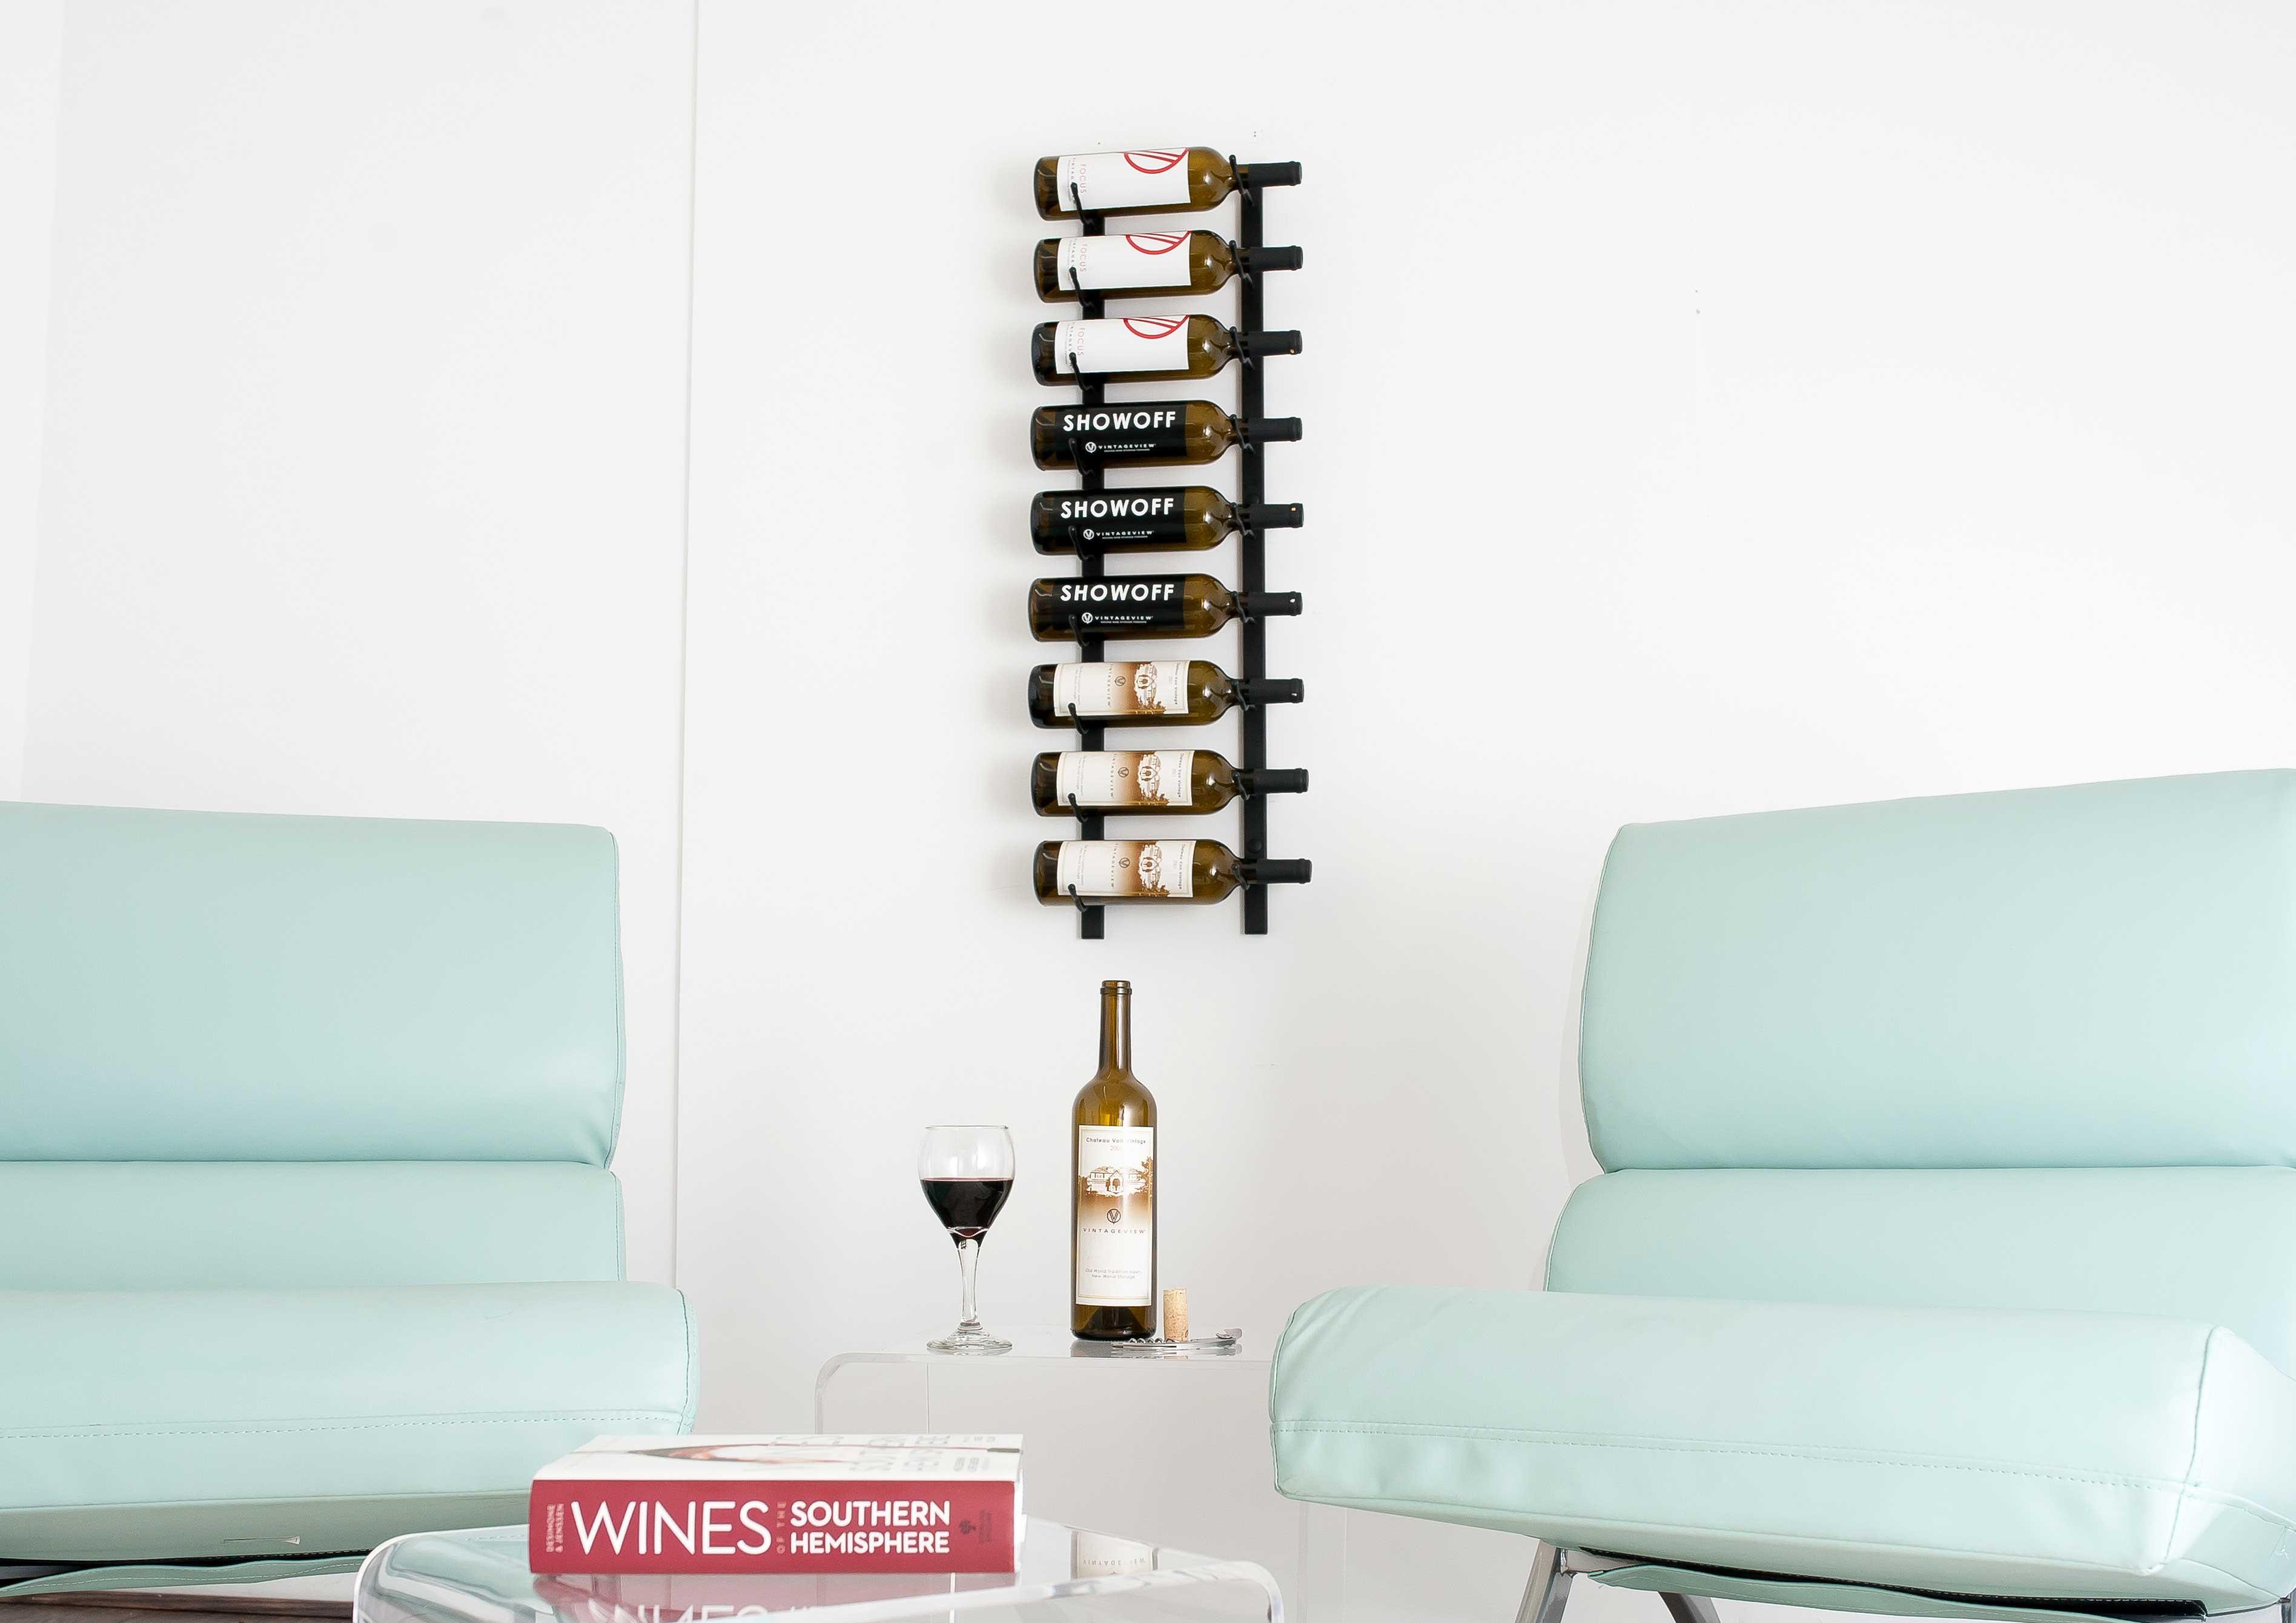 vintage view wsblack pearl   bottle vintage view wine rack  - ' wall mount  bottle wine rack  black chrome finish